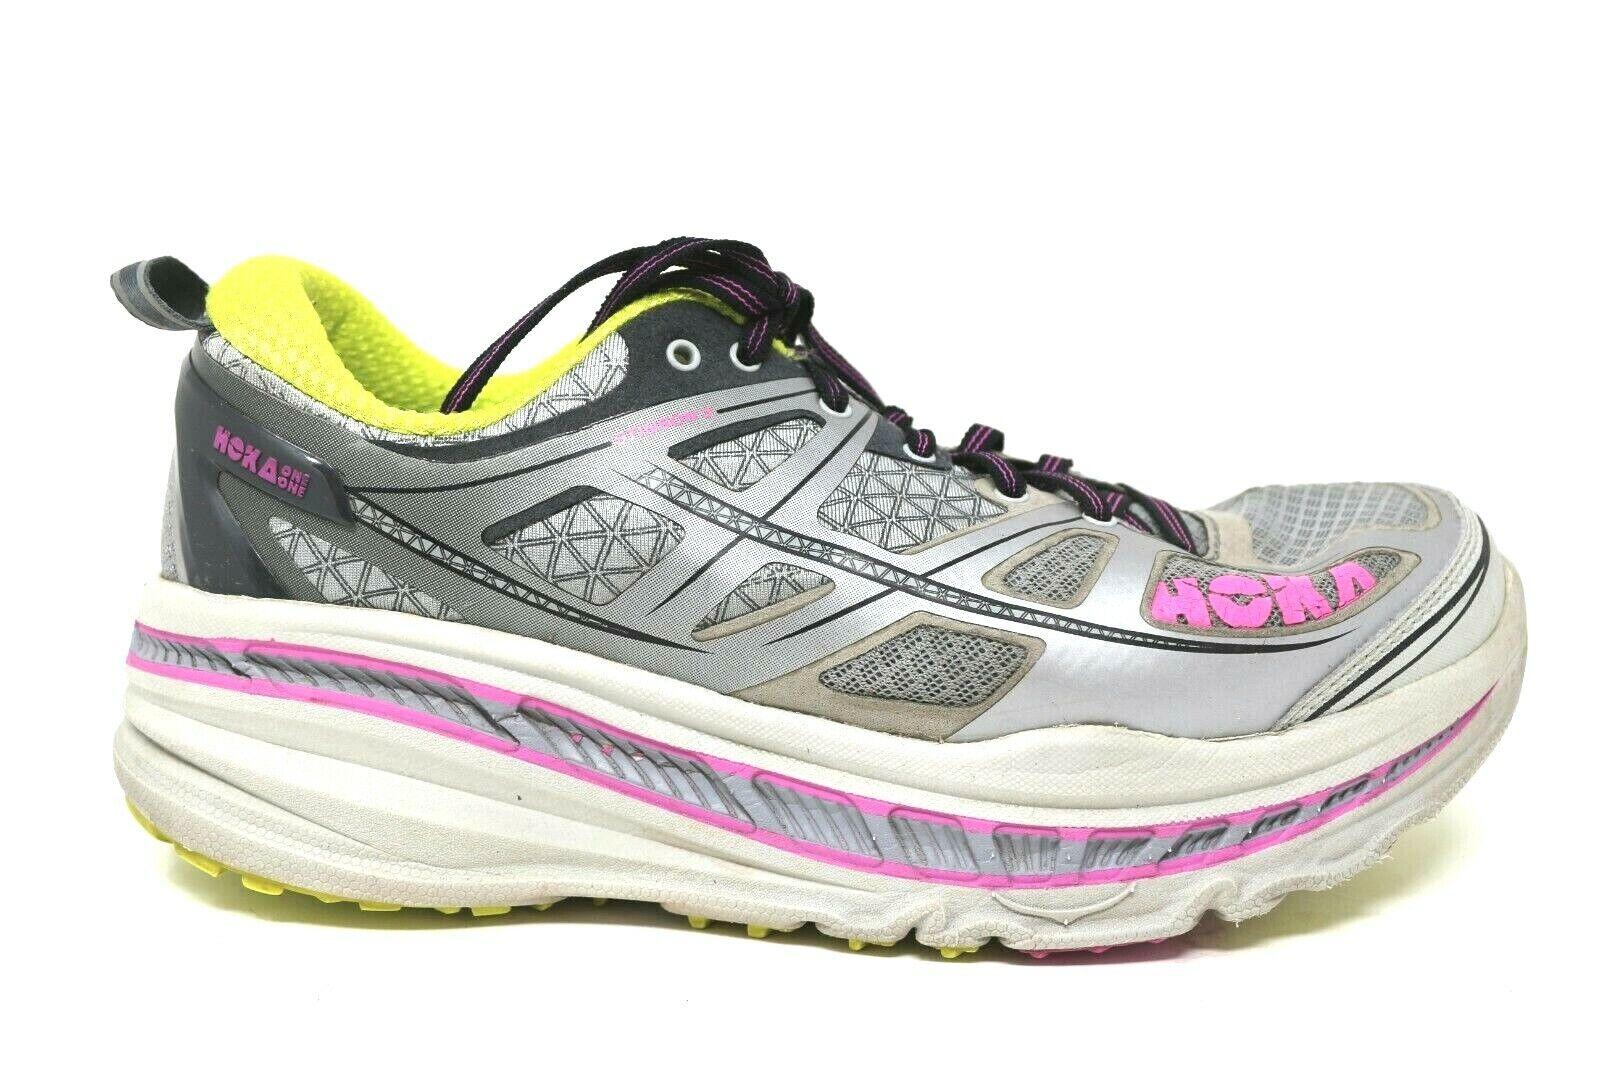 HOKA ONE ONE Stinson Athletic Running scarpe donna Dimensione 10.5